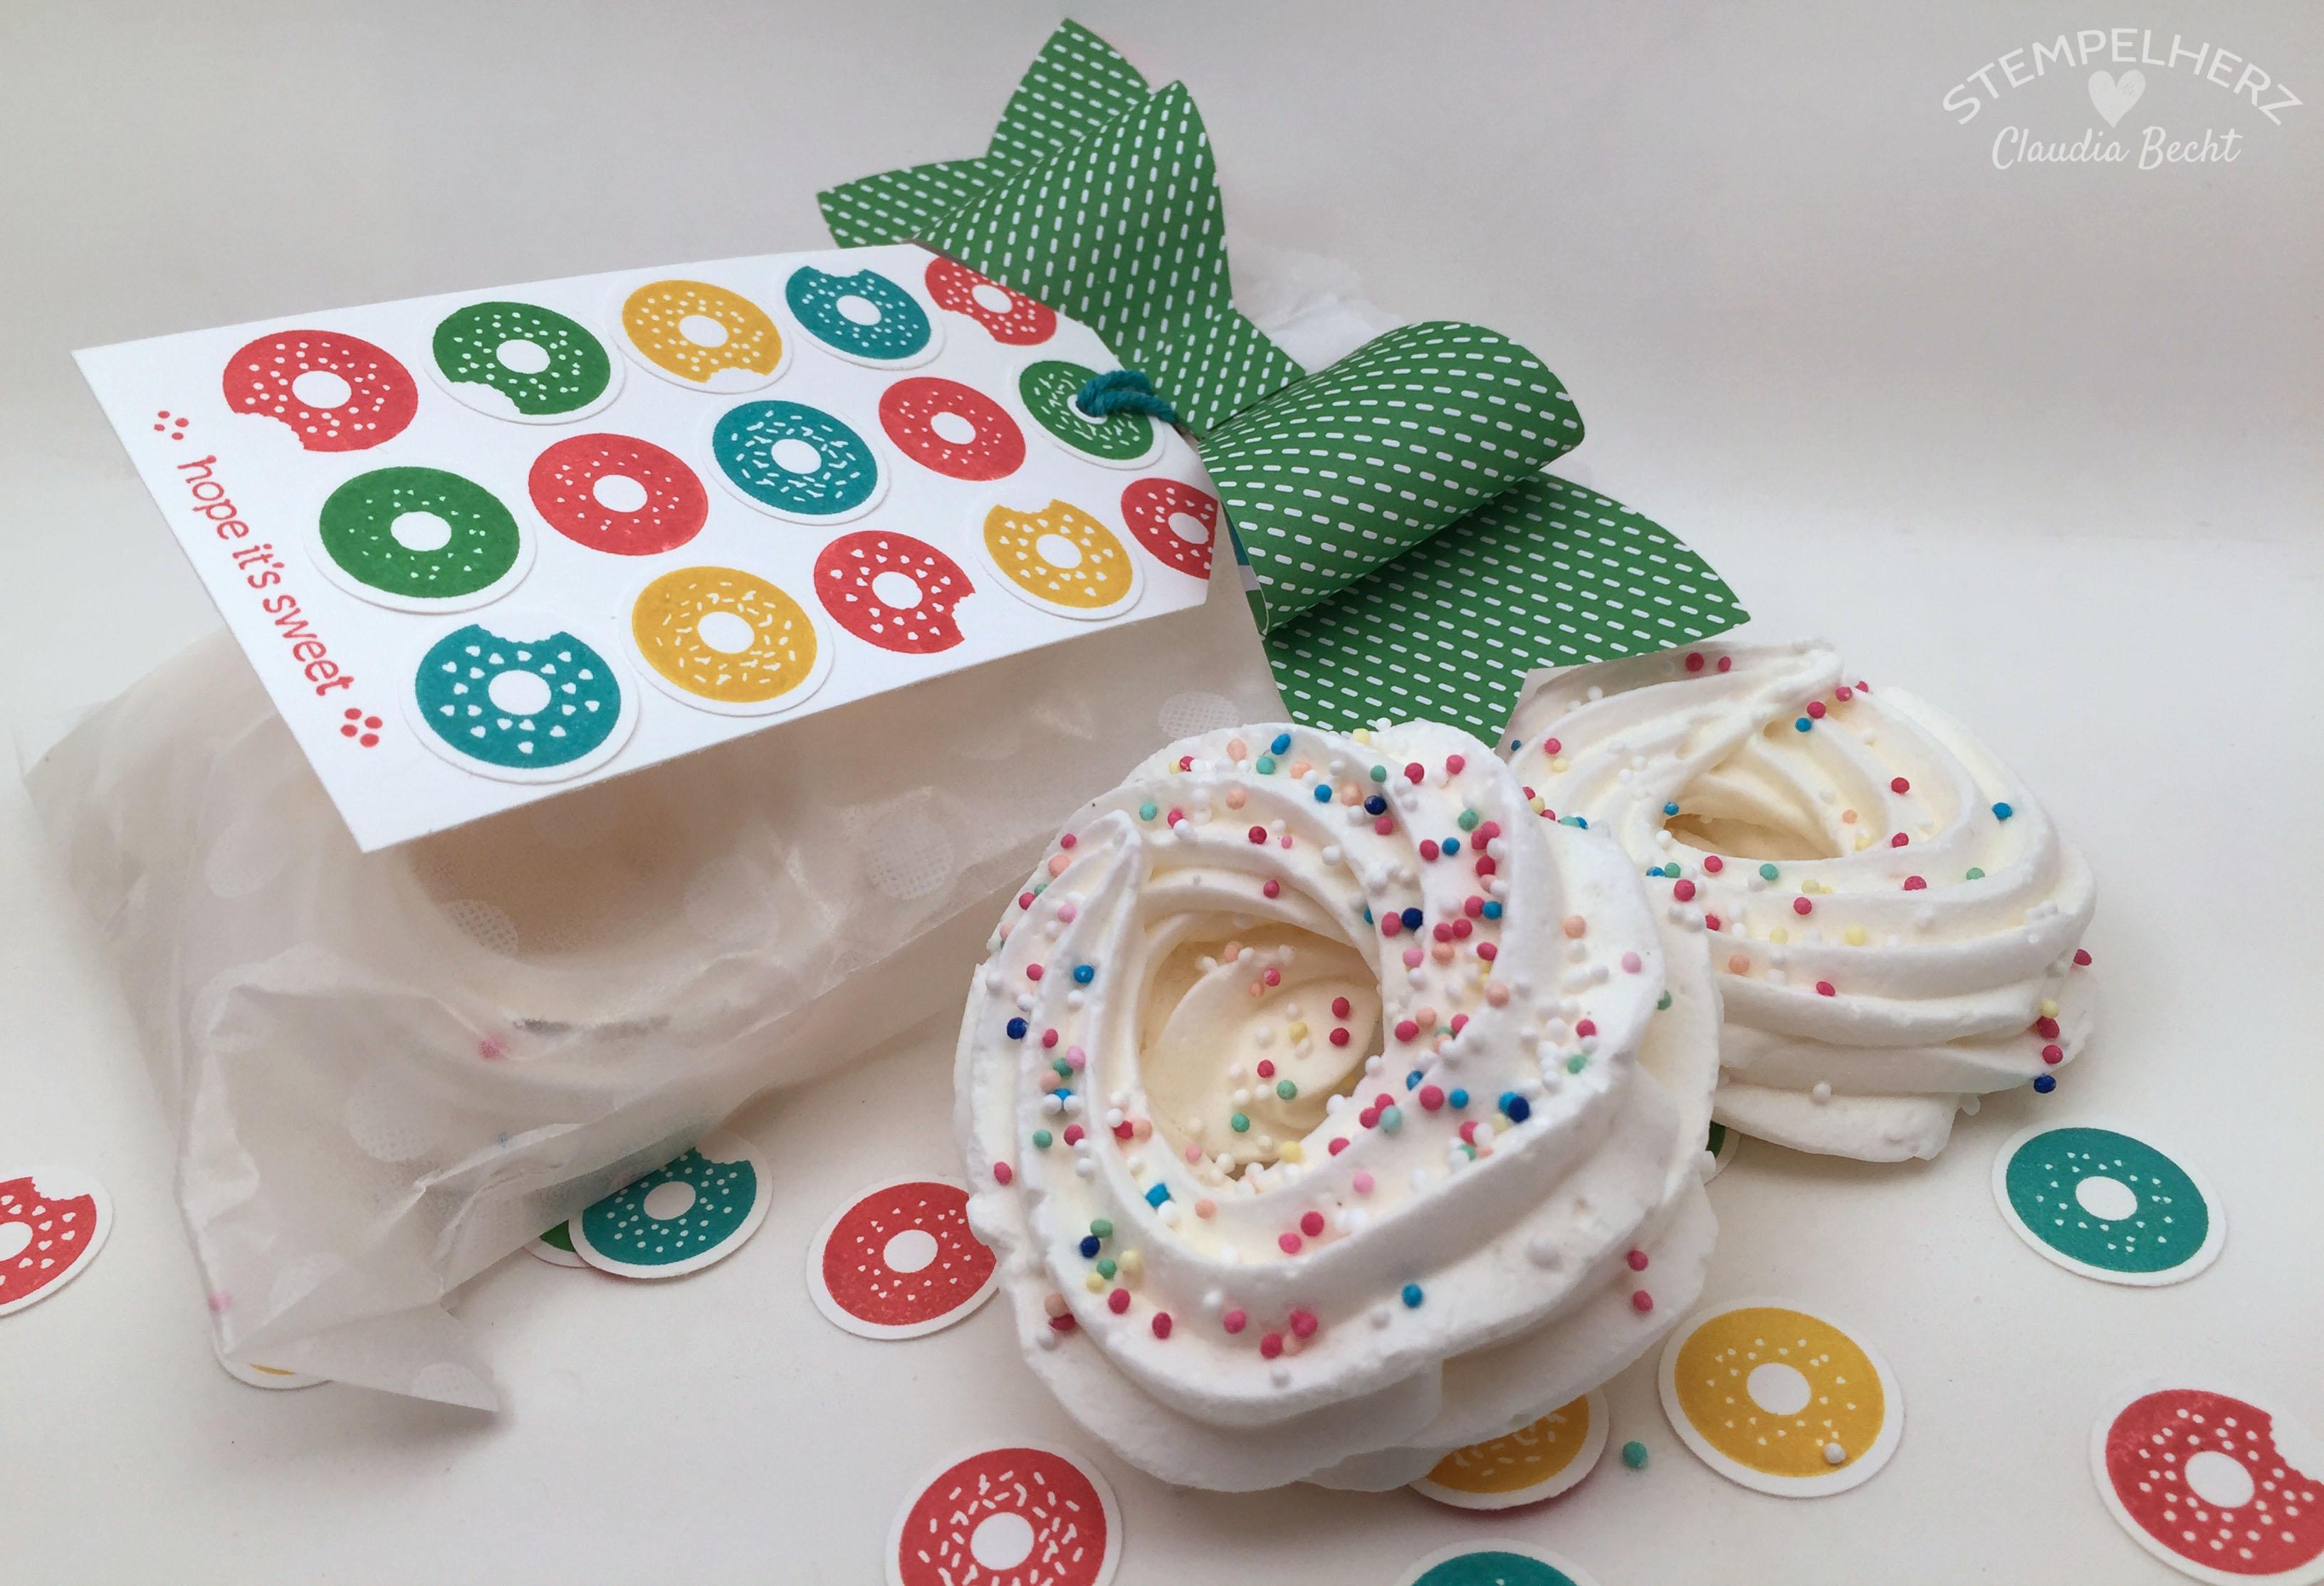 Stampin Up-Stempelherz-Geburtstag-Verpackung-Bag-Geburtstagskarte-Zeig es am Montag Geburtstagsset Sprinkles on Top 19.3b